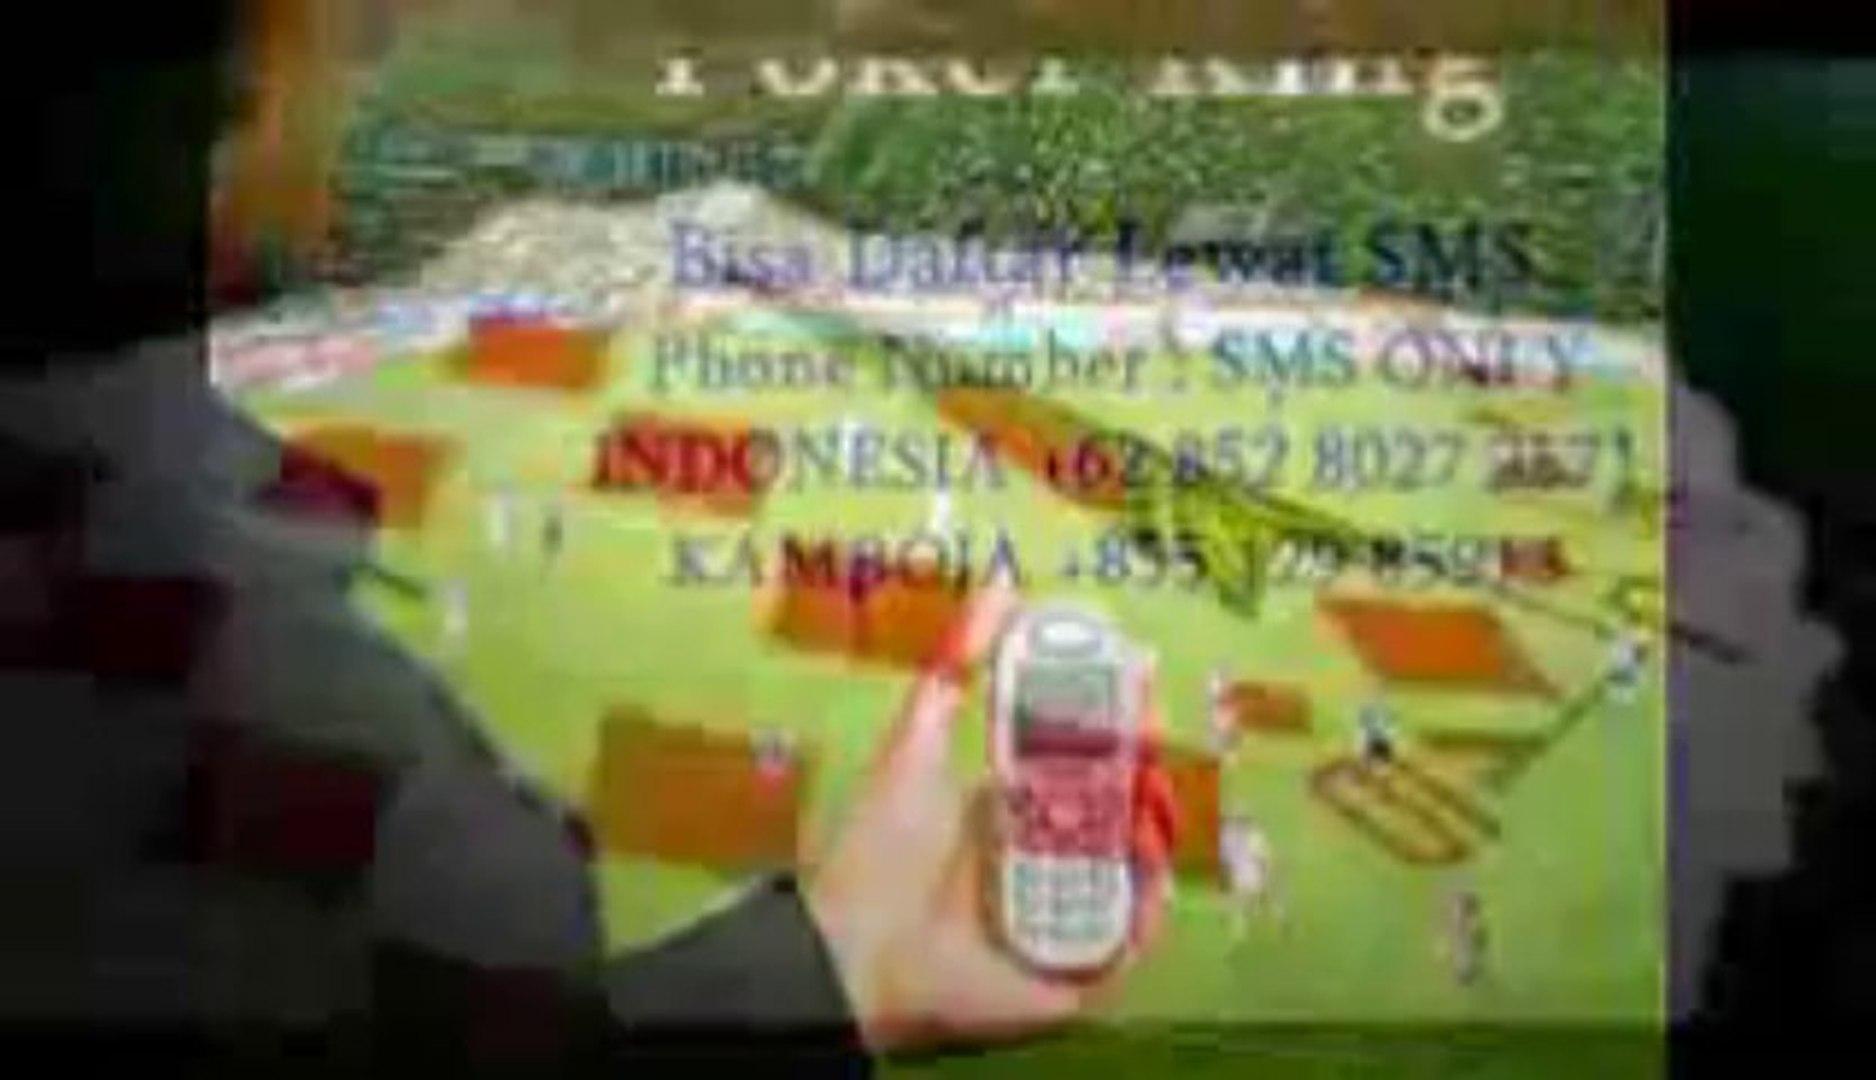 AgenBola855.com AgenTaruhan Bola, Agen Judi Bola, SBOBET Casino Online